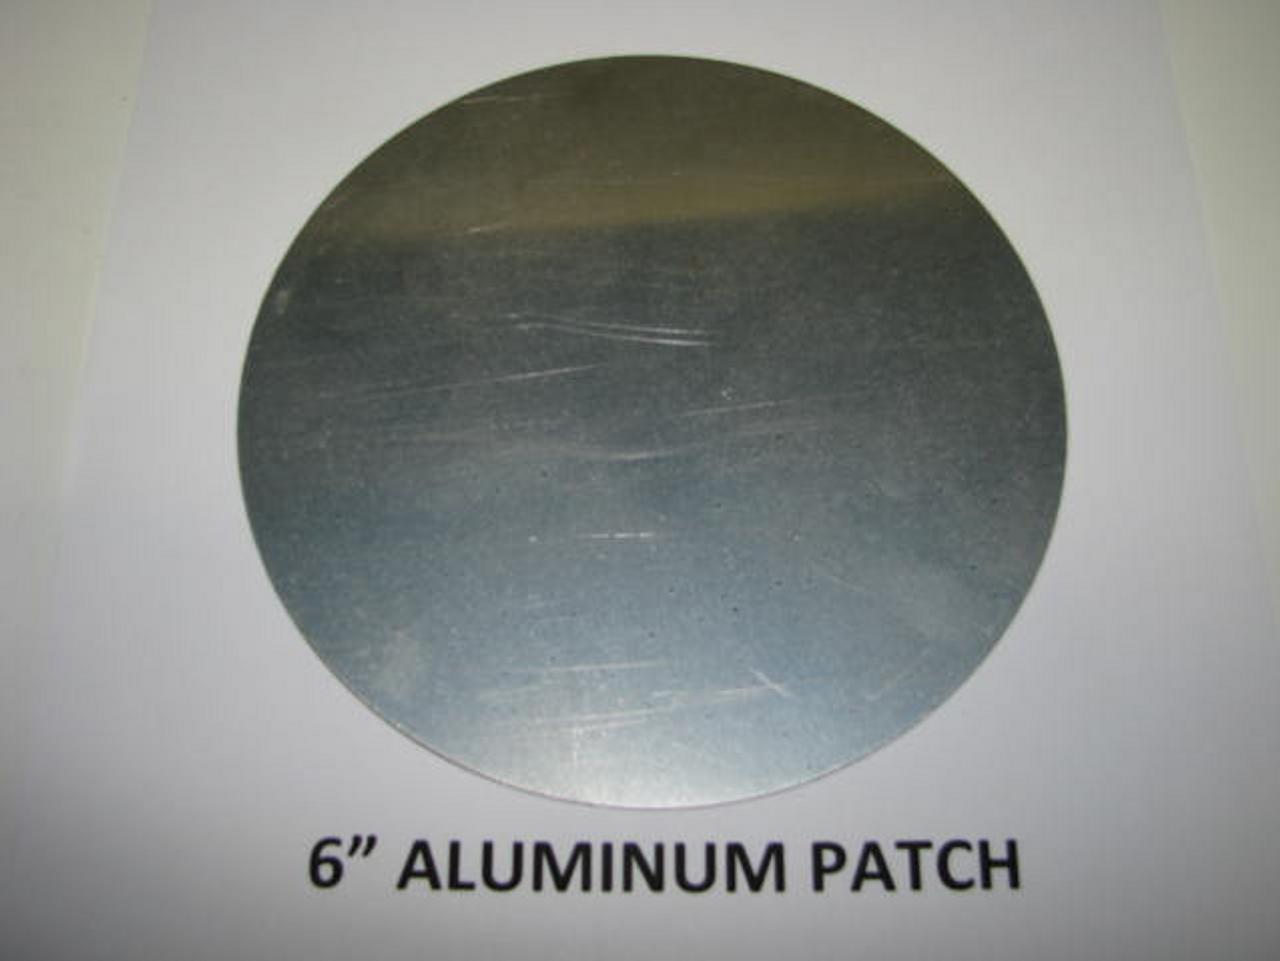 "Aluminum Round Patch - 6"" - (CBP006) FRONT OVERHEAD VIEW"